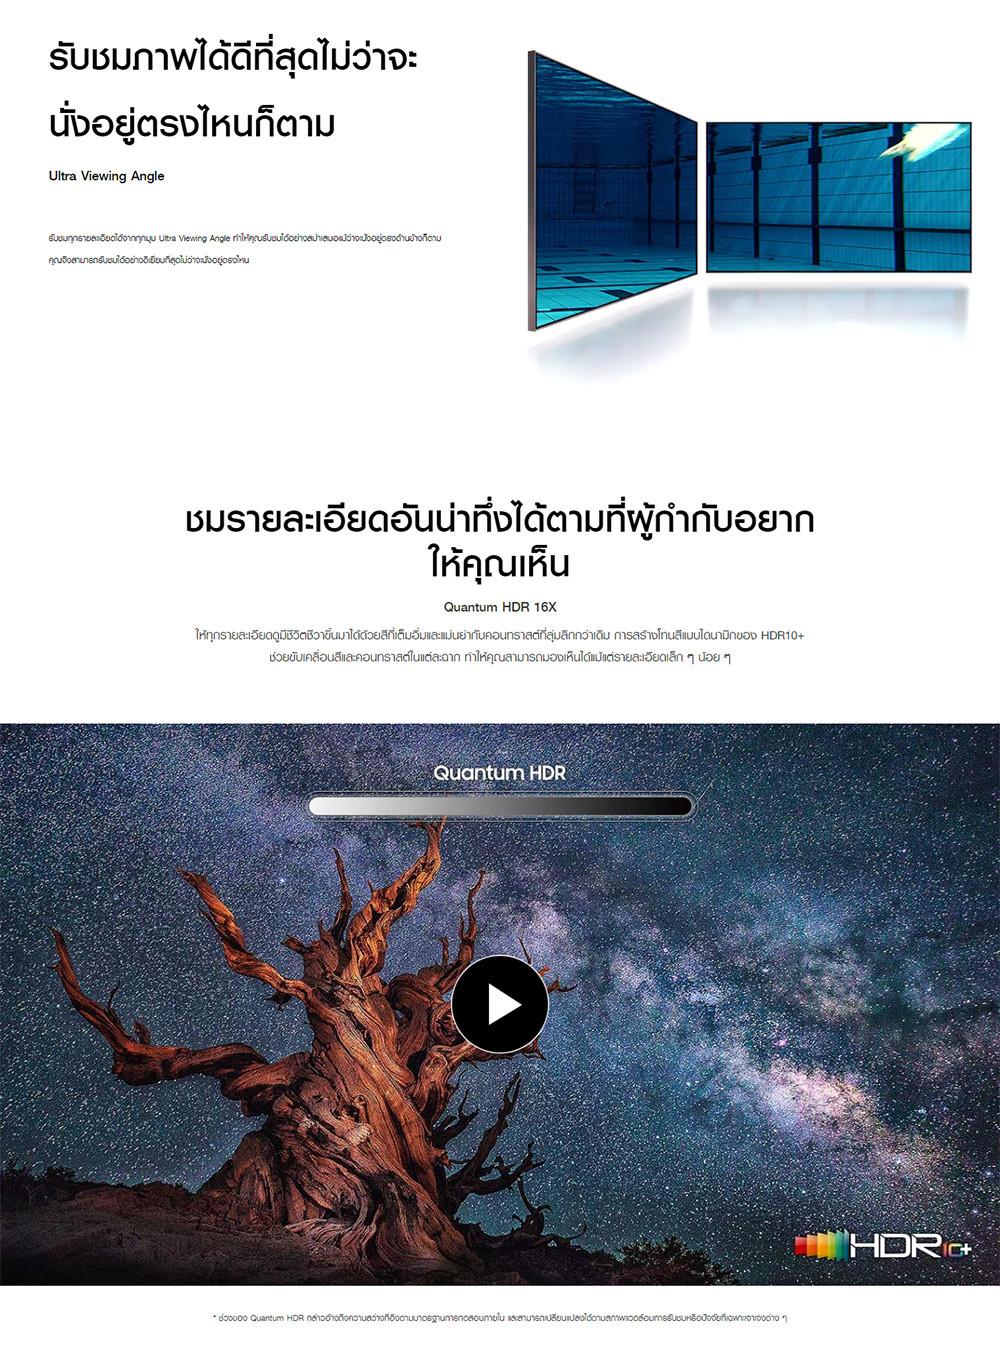 content-image_4.jpg